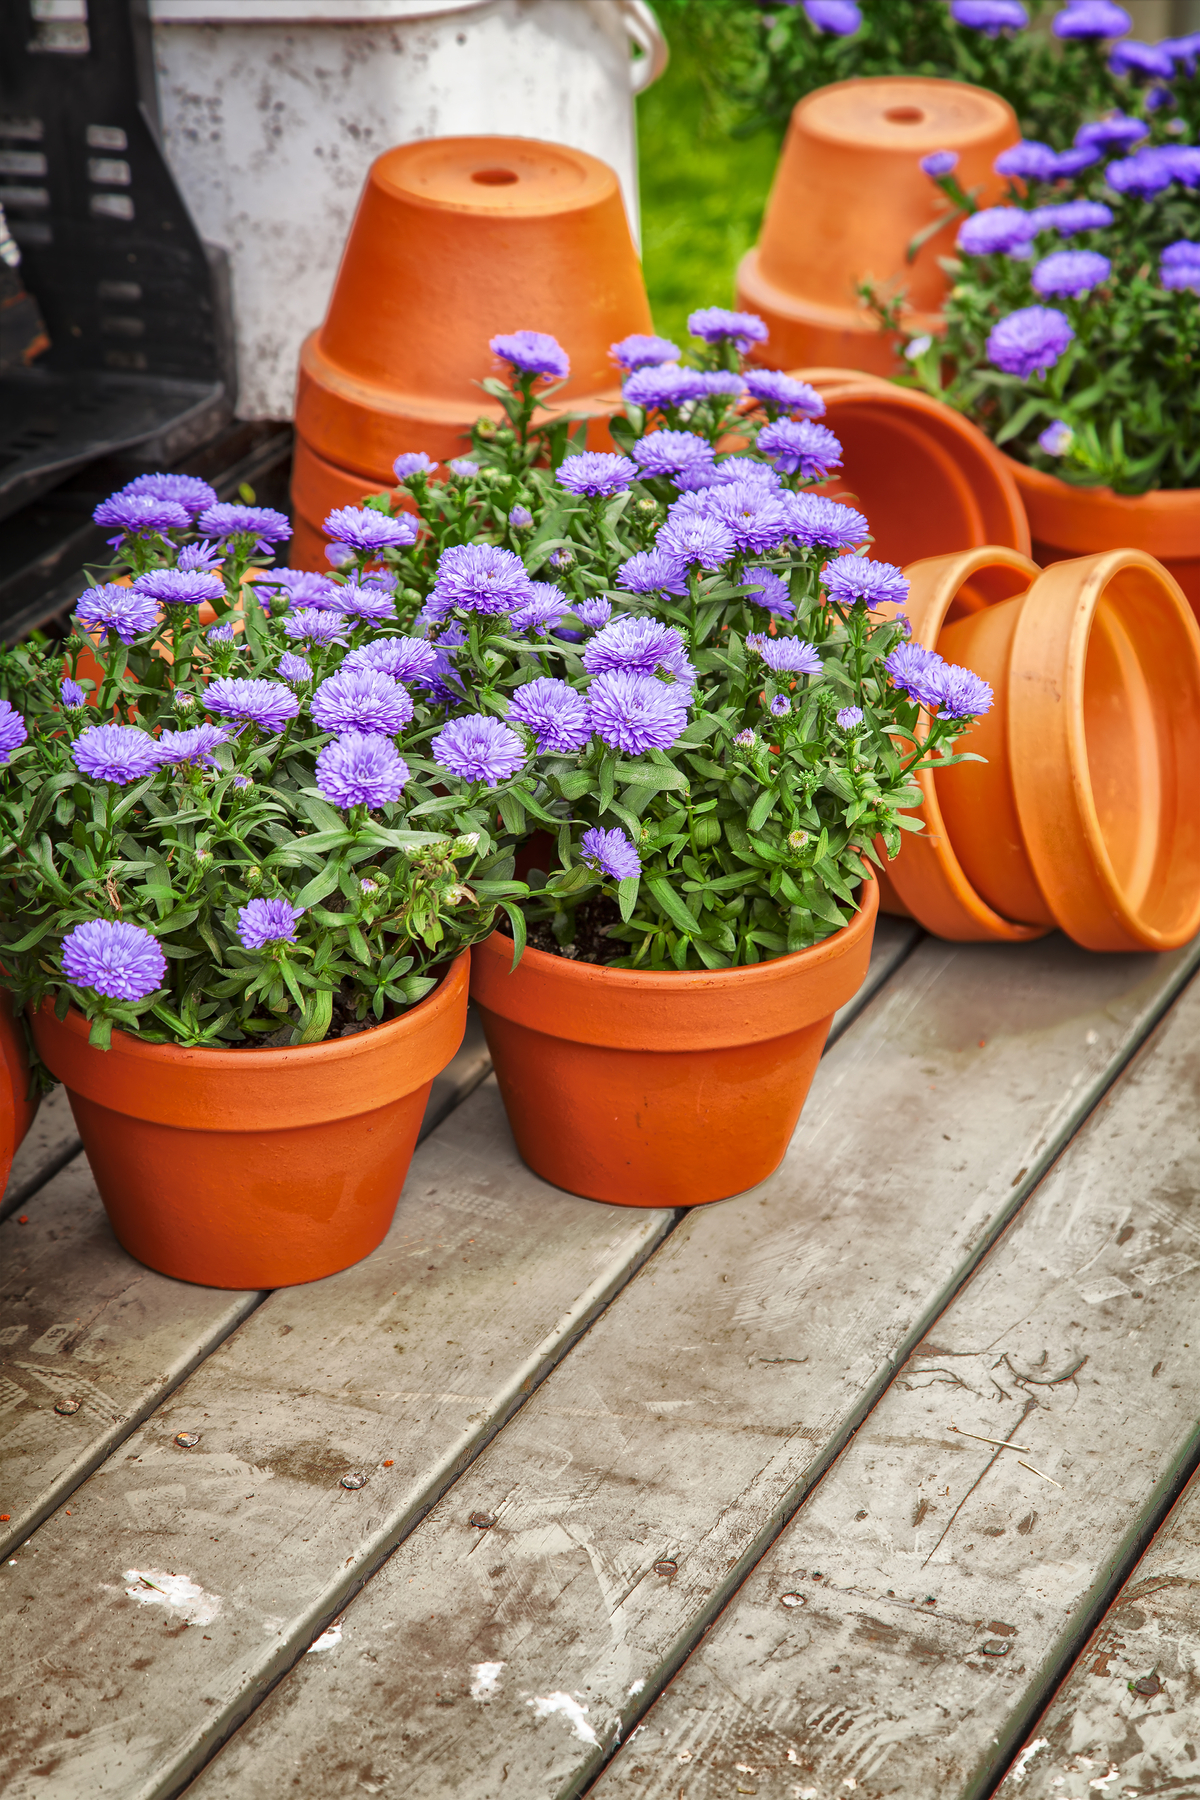 perennials | flower | porch | planters | perennials for planter | container gardening | gardening | garden | porch planters